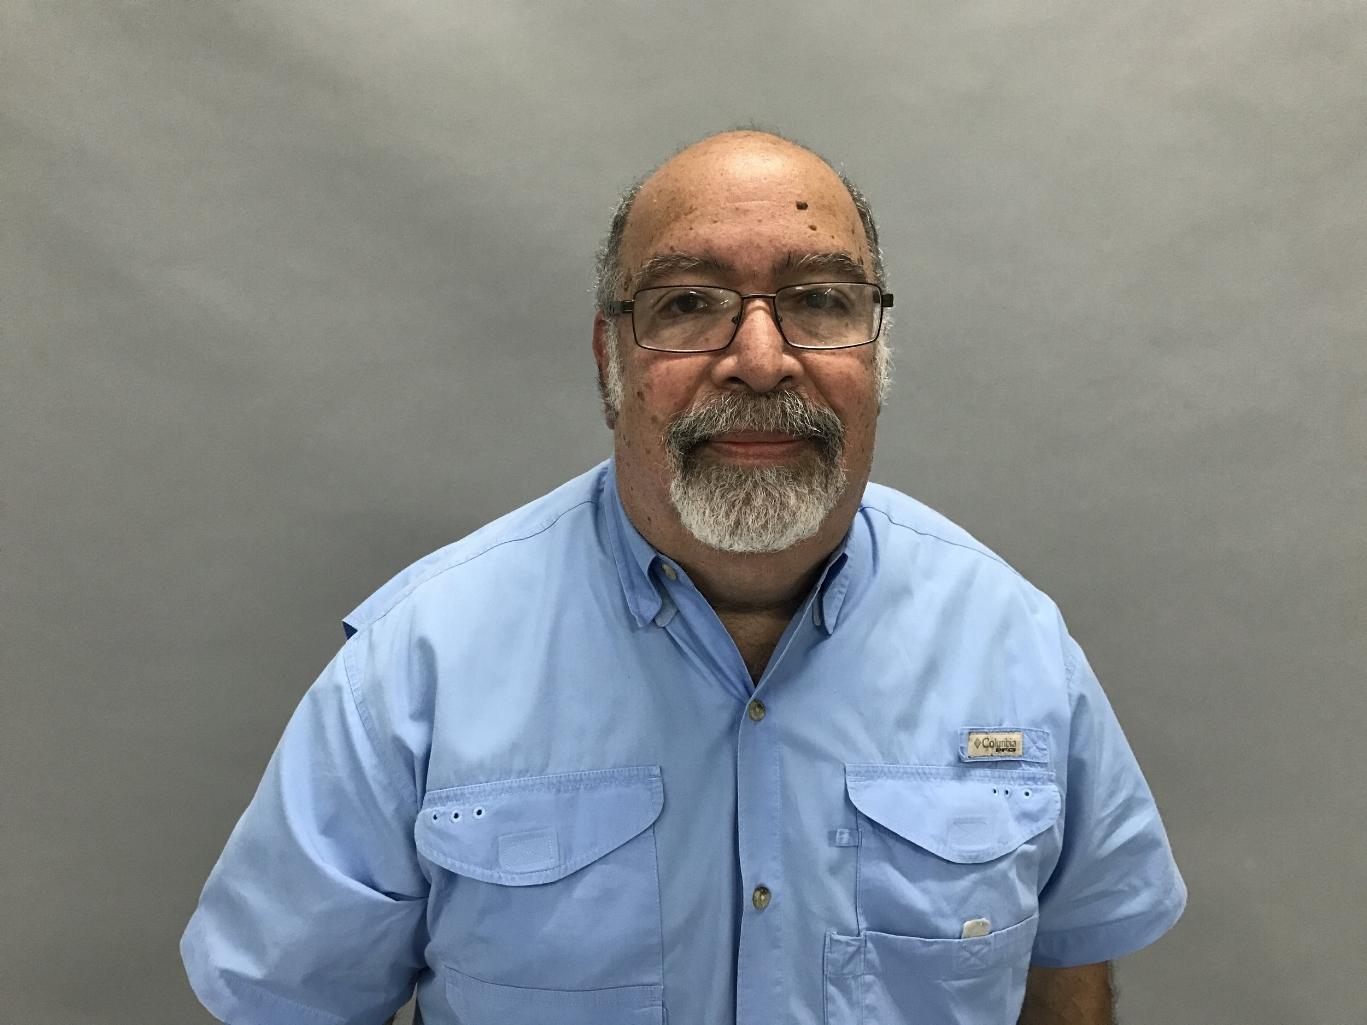 Roberto Fogel MD-Secretary